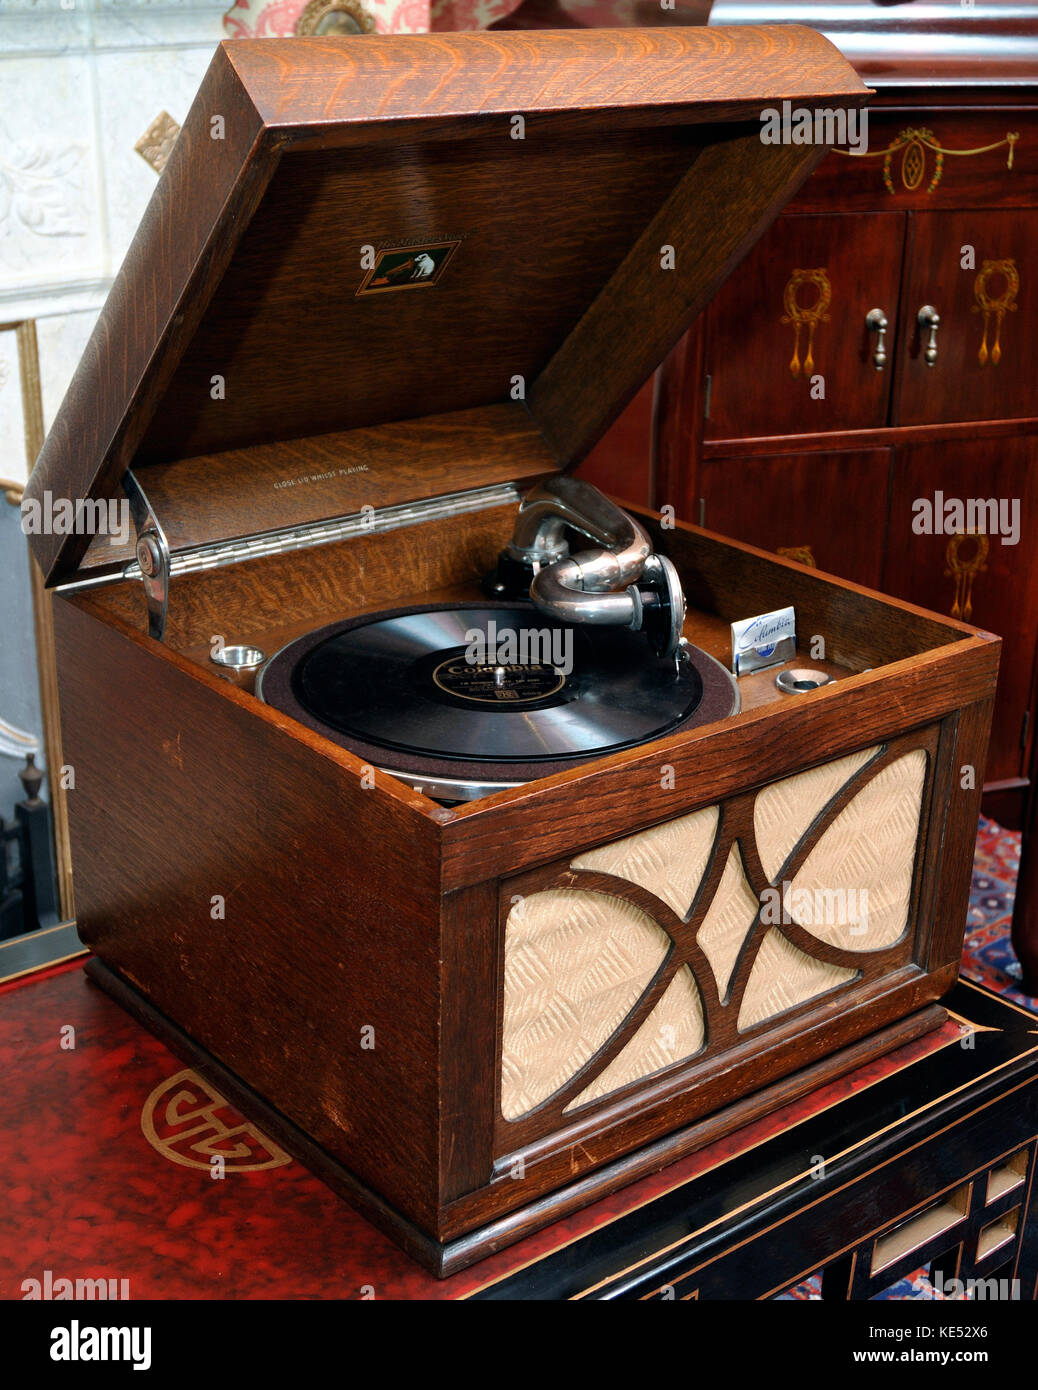 Hmv Gramophone Record Stock Photos & Hmv Gramophone Record